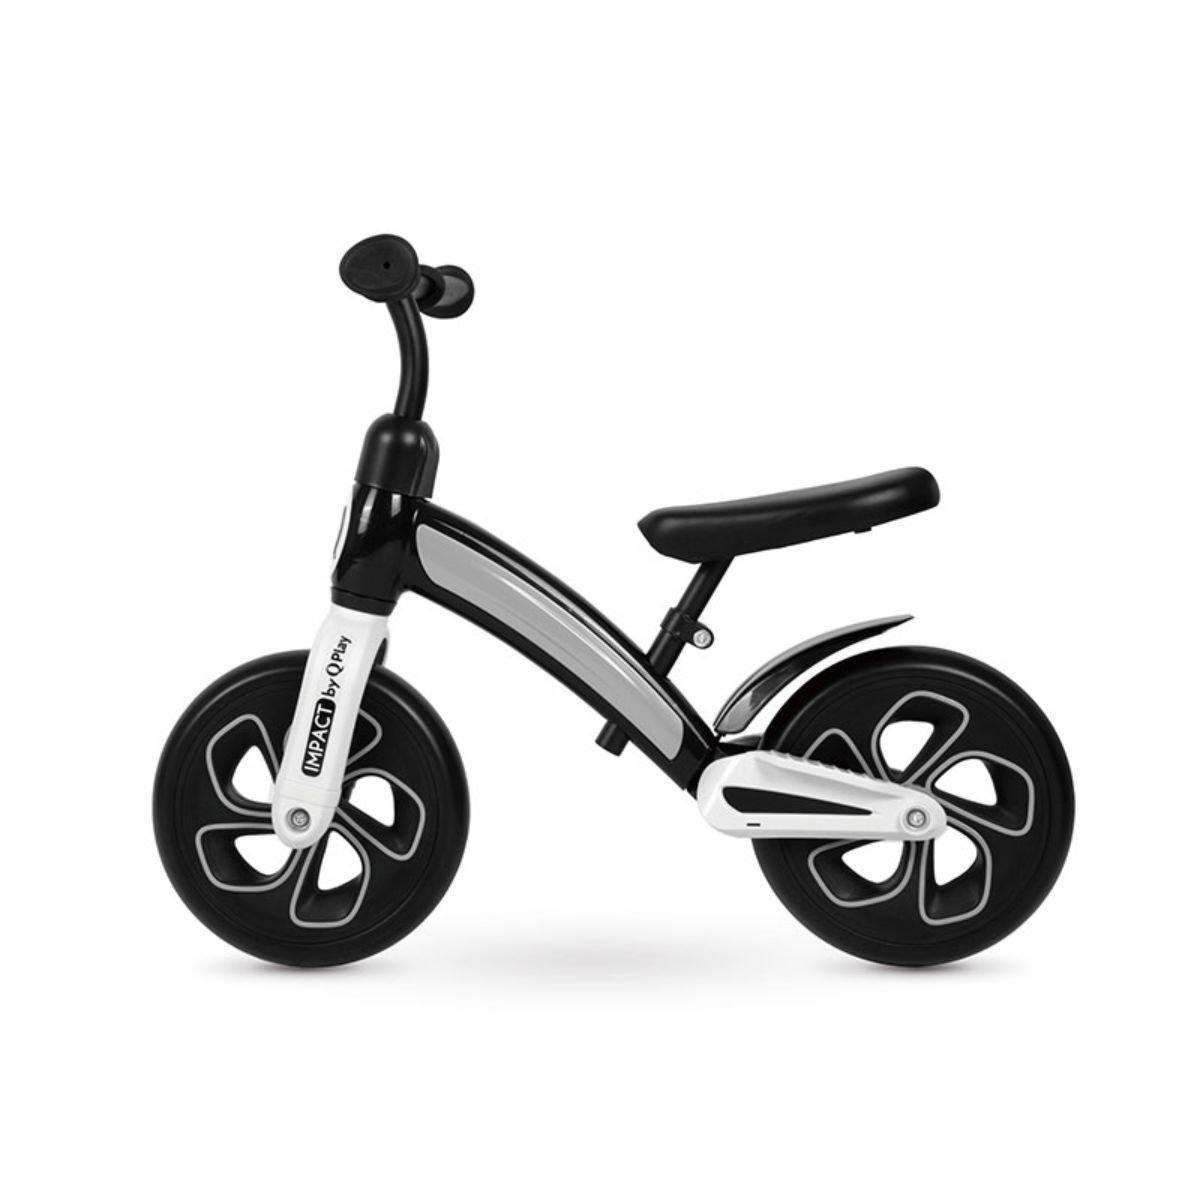 Bicicleta fara pedale DHS Baby Qplay Impact, Negru, 10 inch